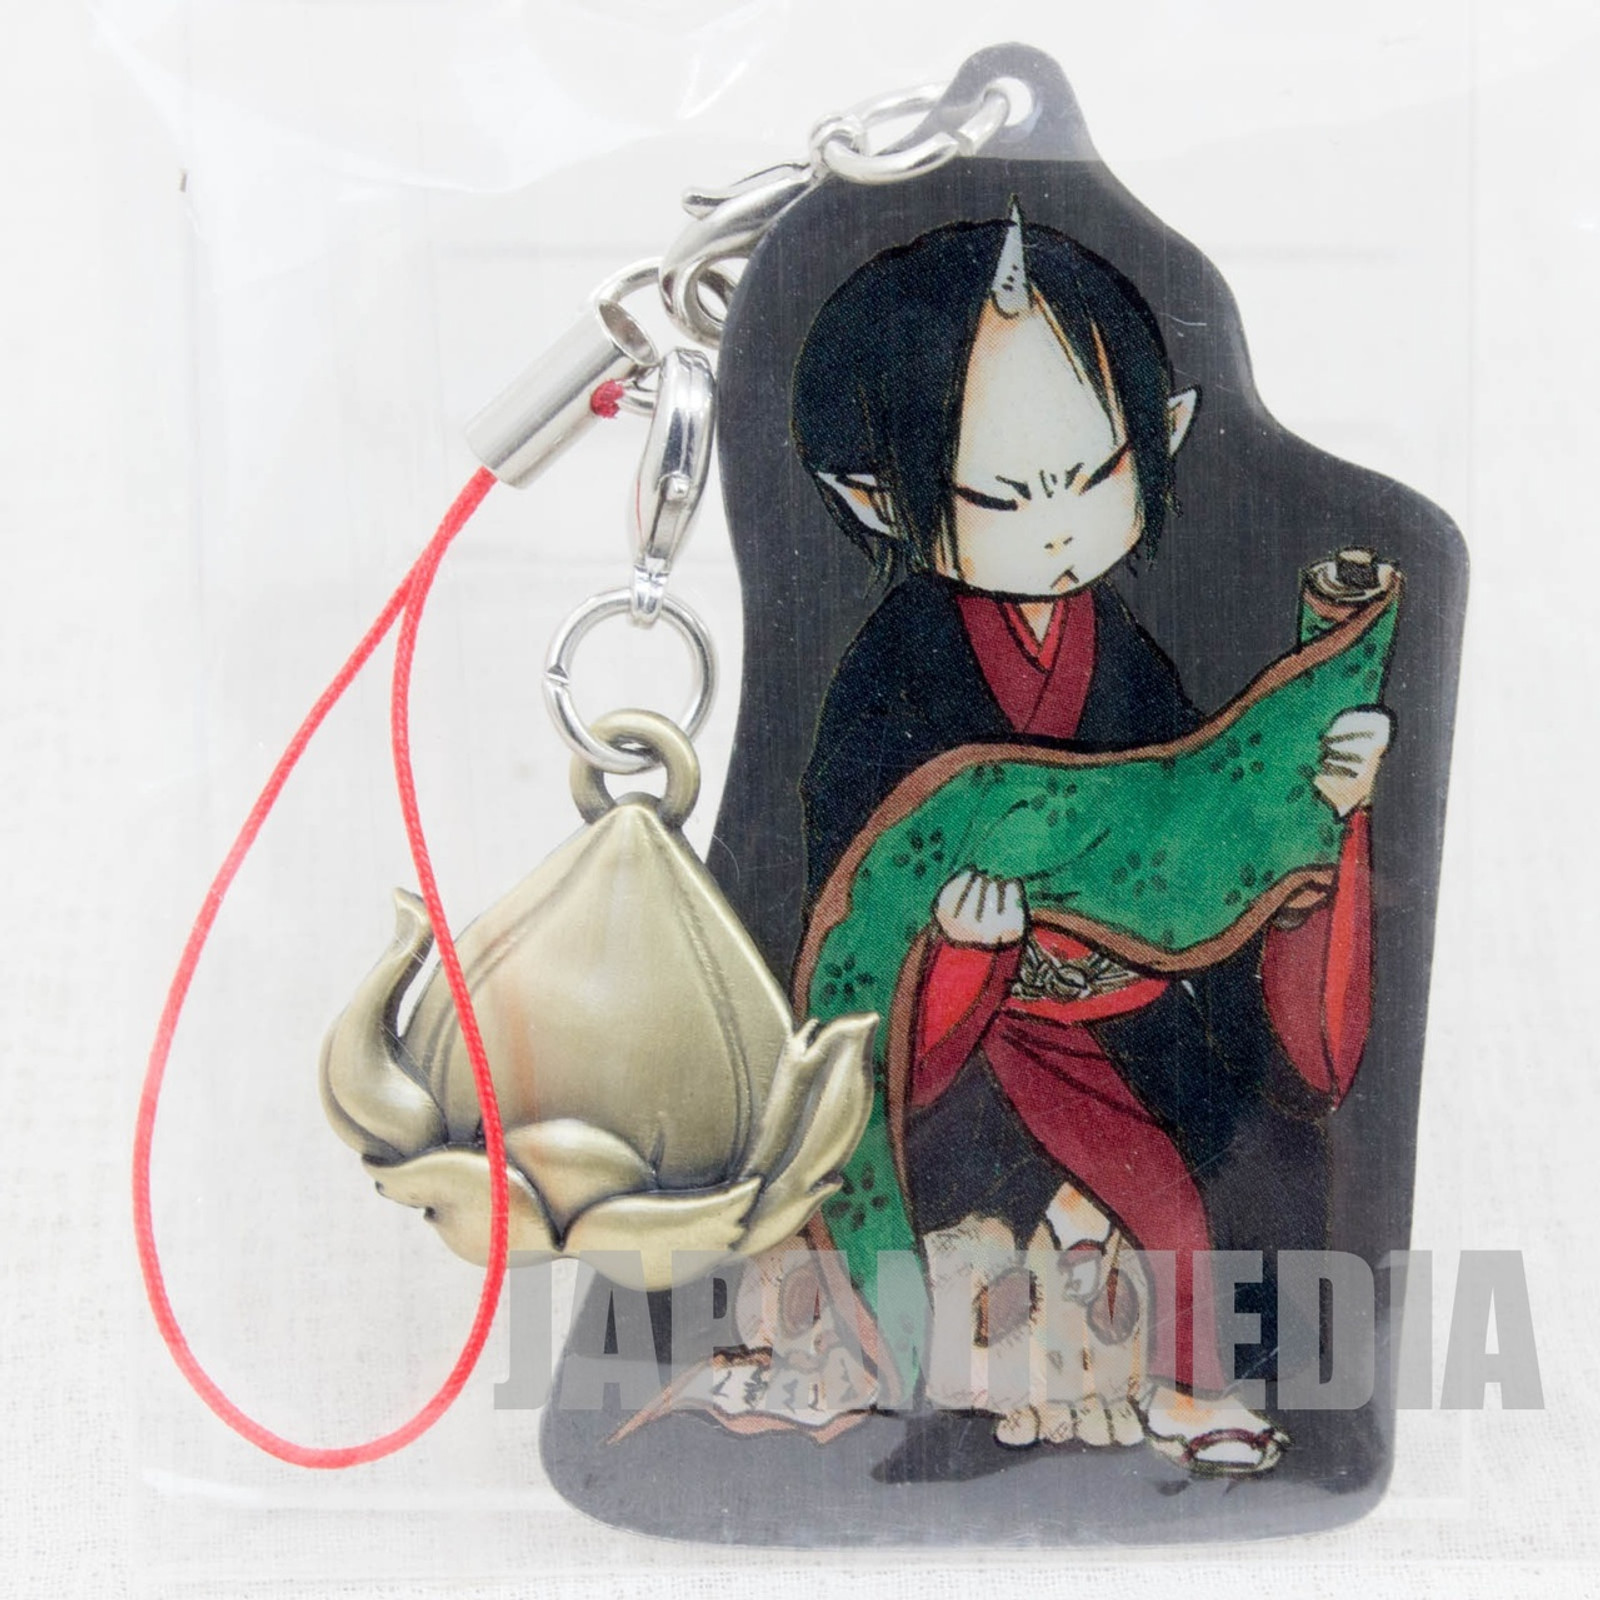 Hoozuki no Reitetsu Hozuki Metal Plate Mascot Strap JAPAN ANIME MANGA